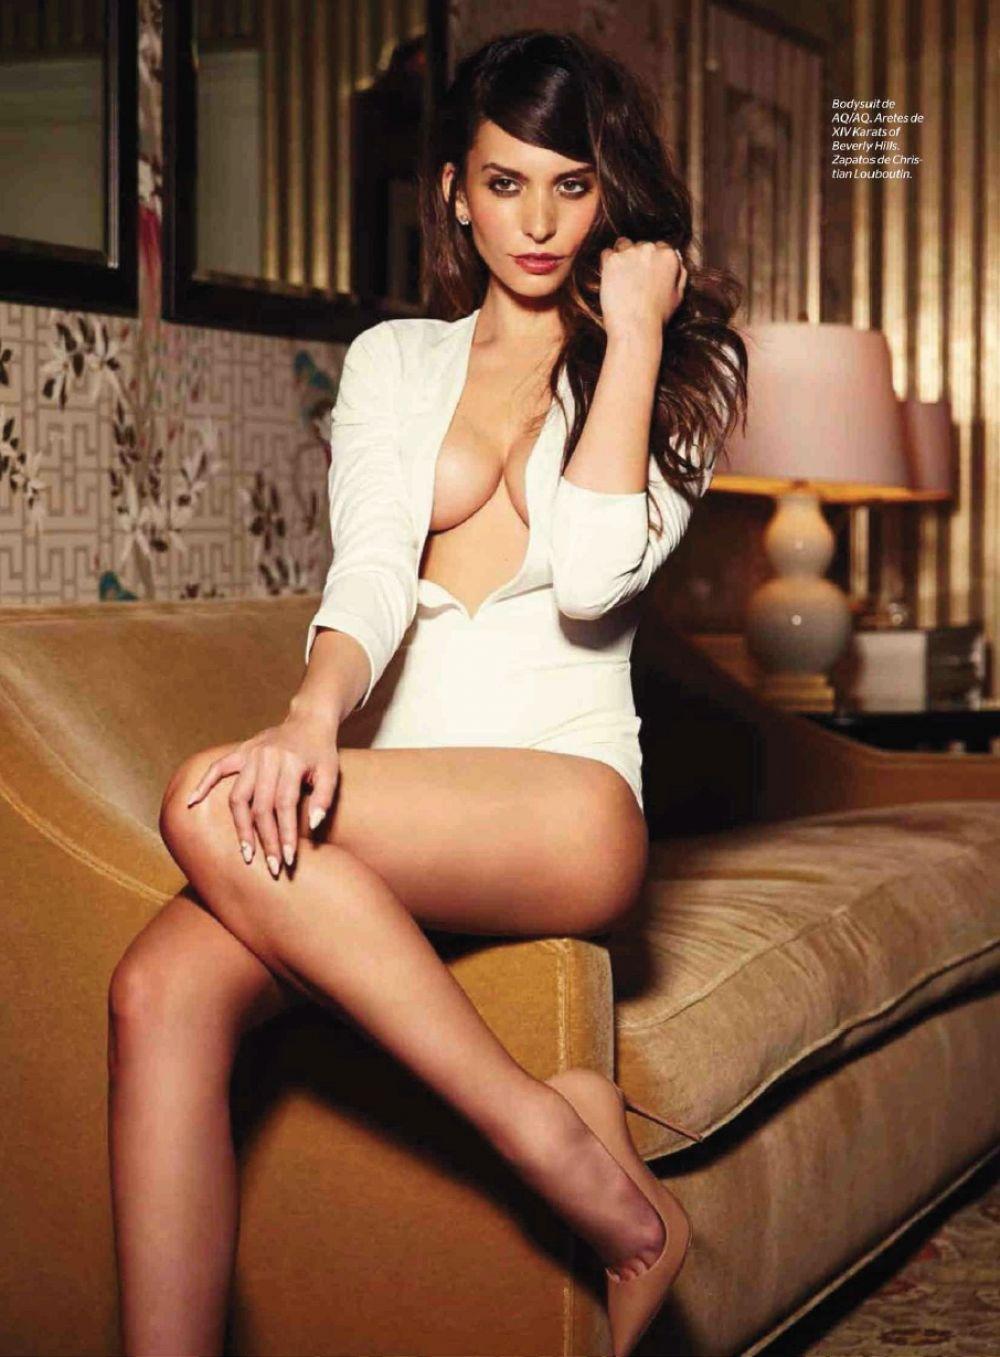 Bikini Genesis Rodriguez nudes (41 foto and video), Pussy, Fappening, Instagram, butt 2015